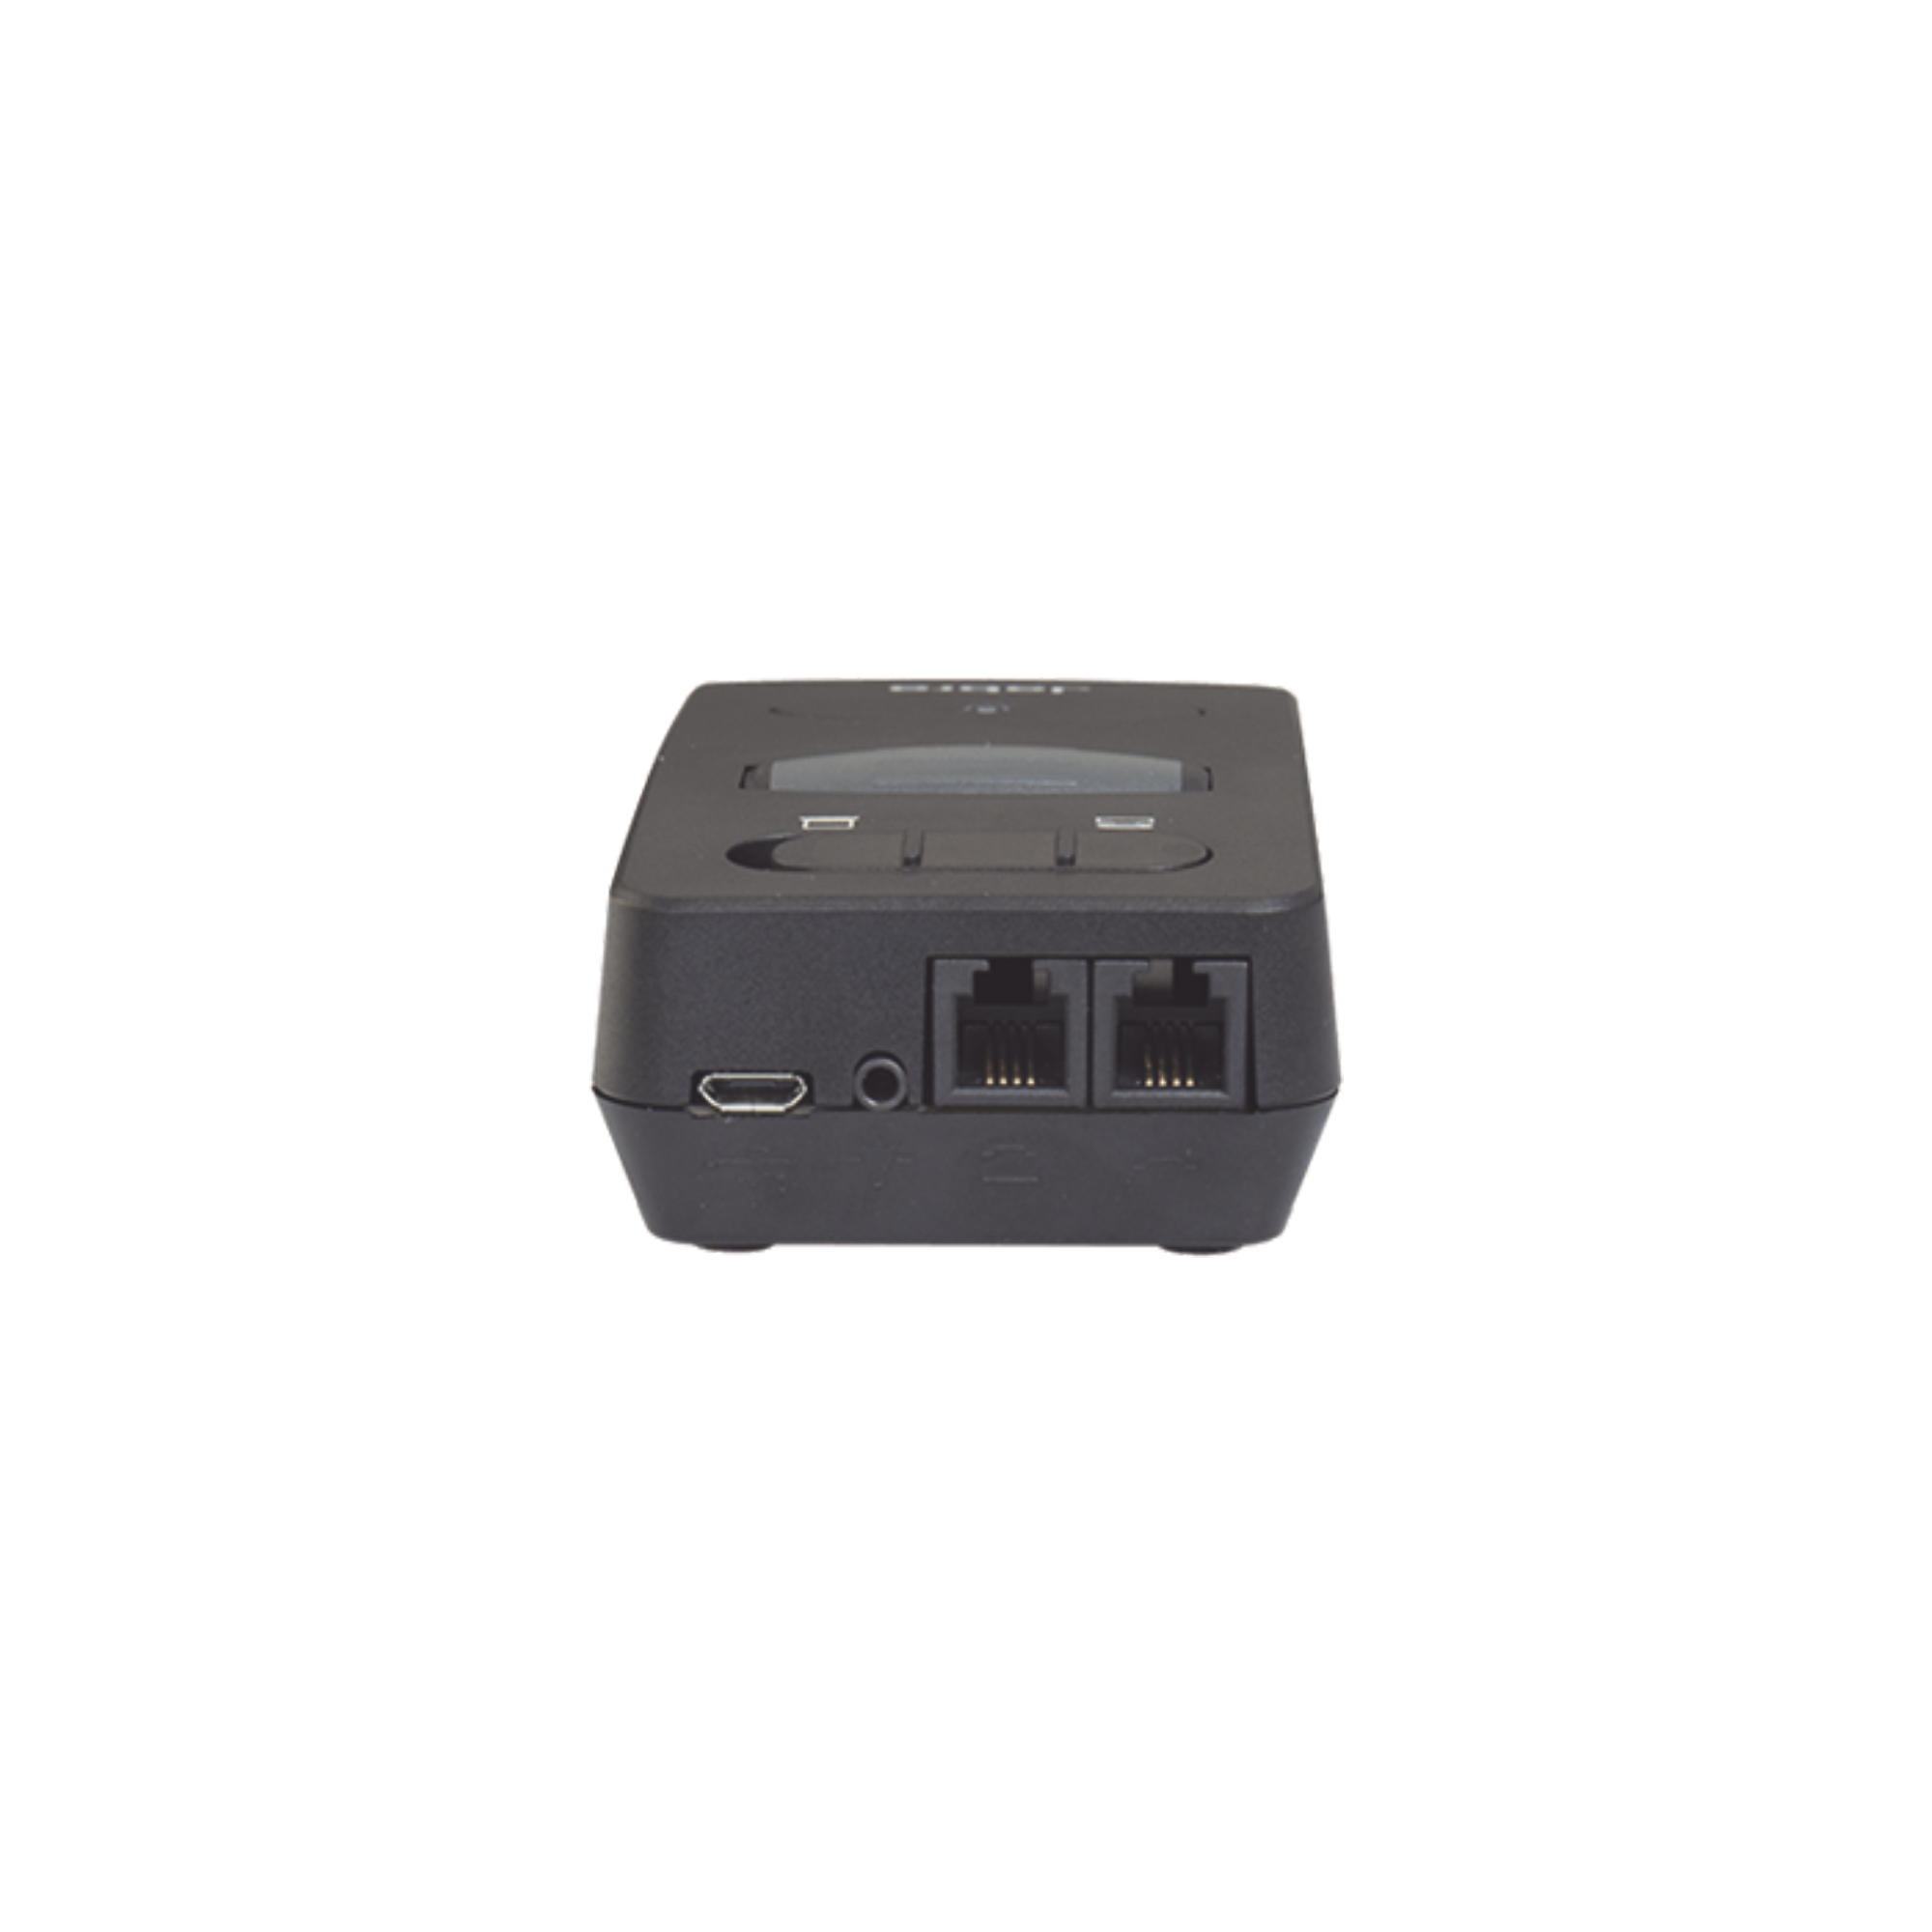 Jabra Link 860 con conexión QD (860-09)